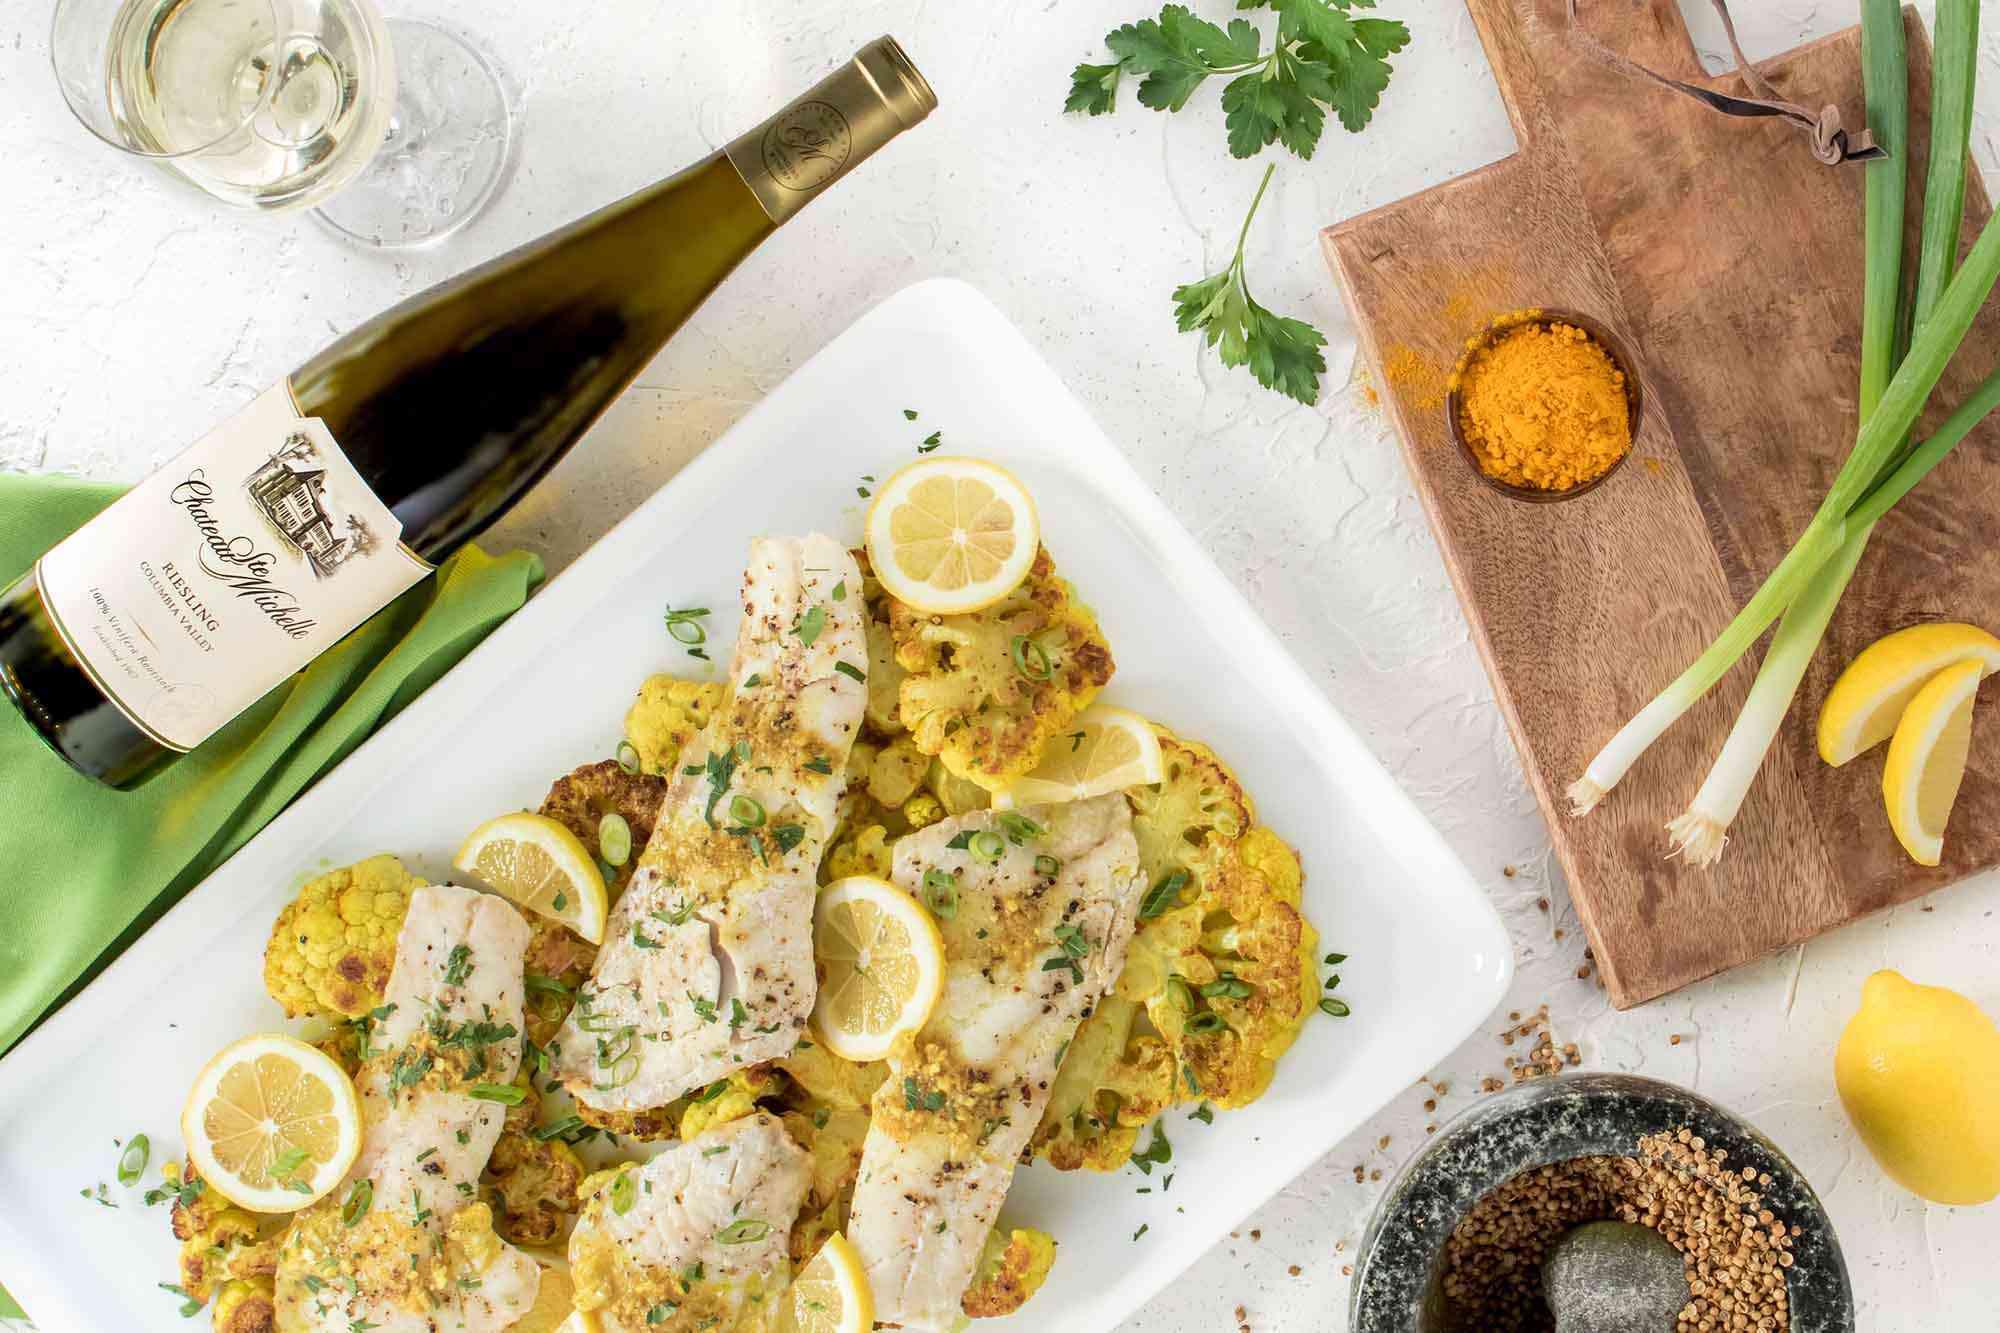 Rockfish with Turmeric Cauliflower Steaks